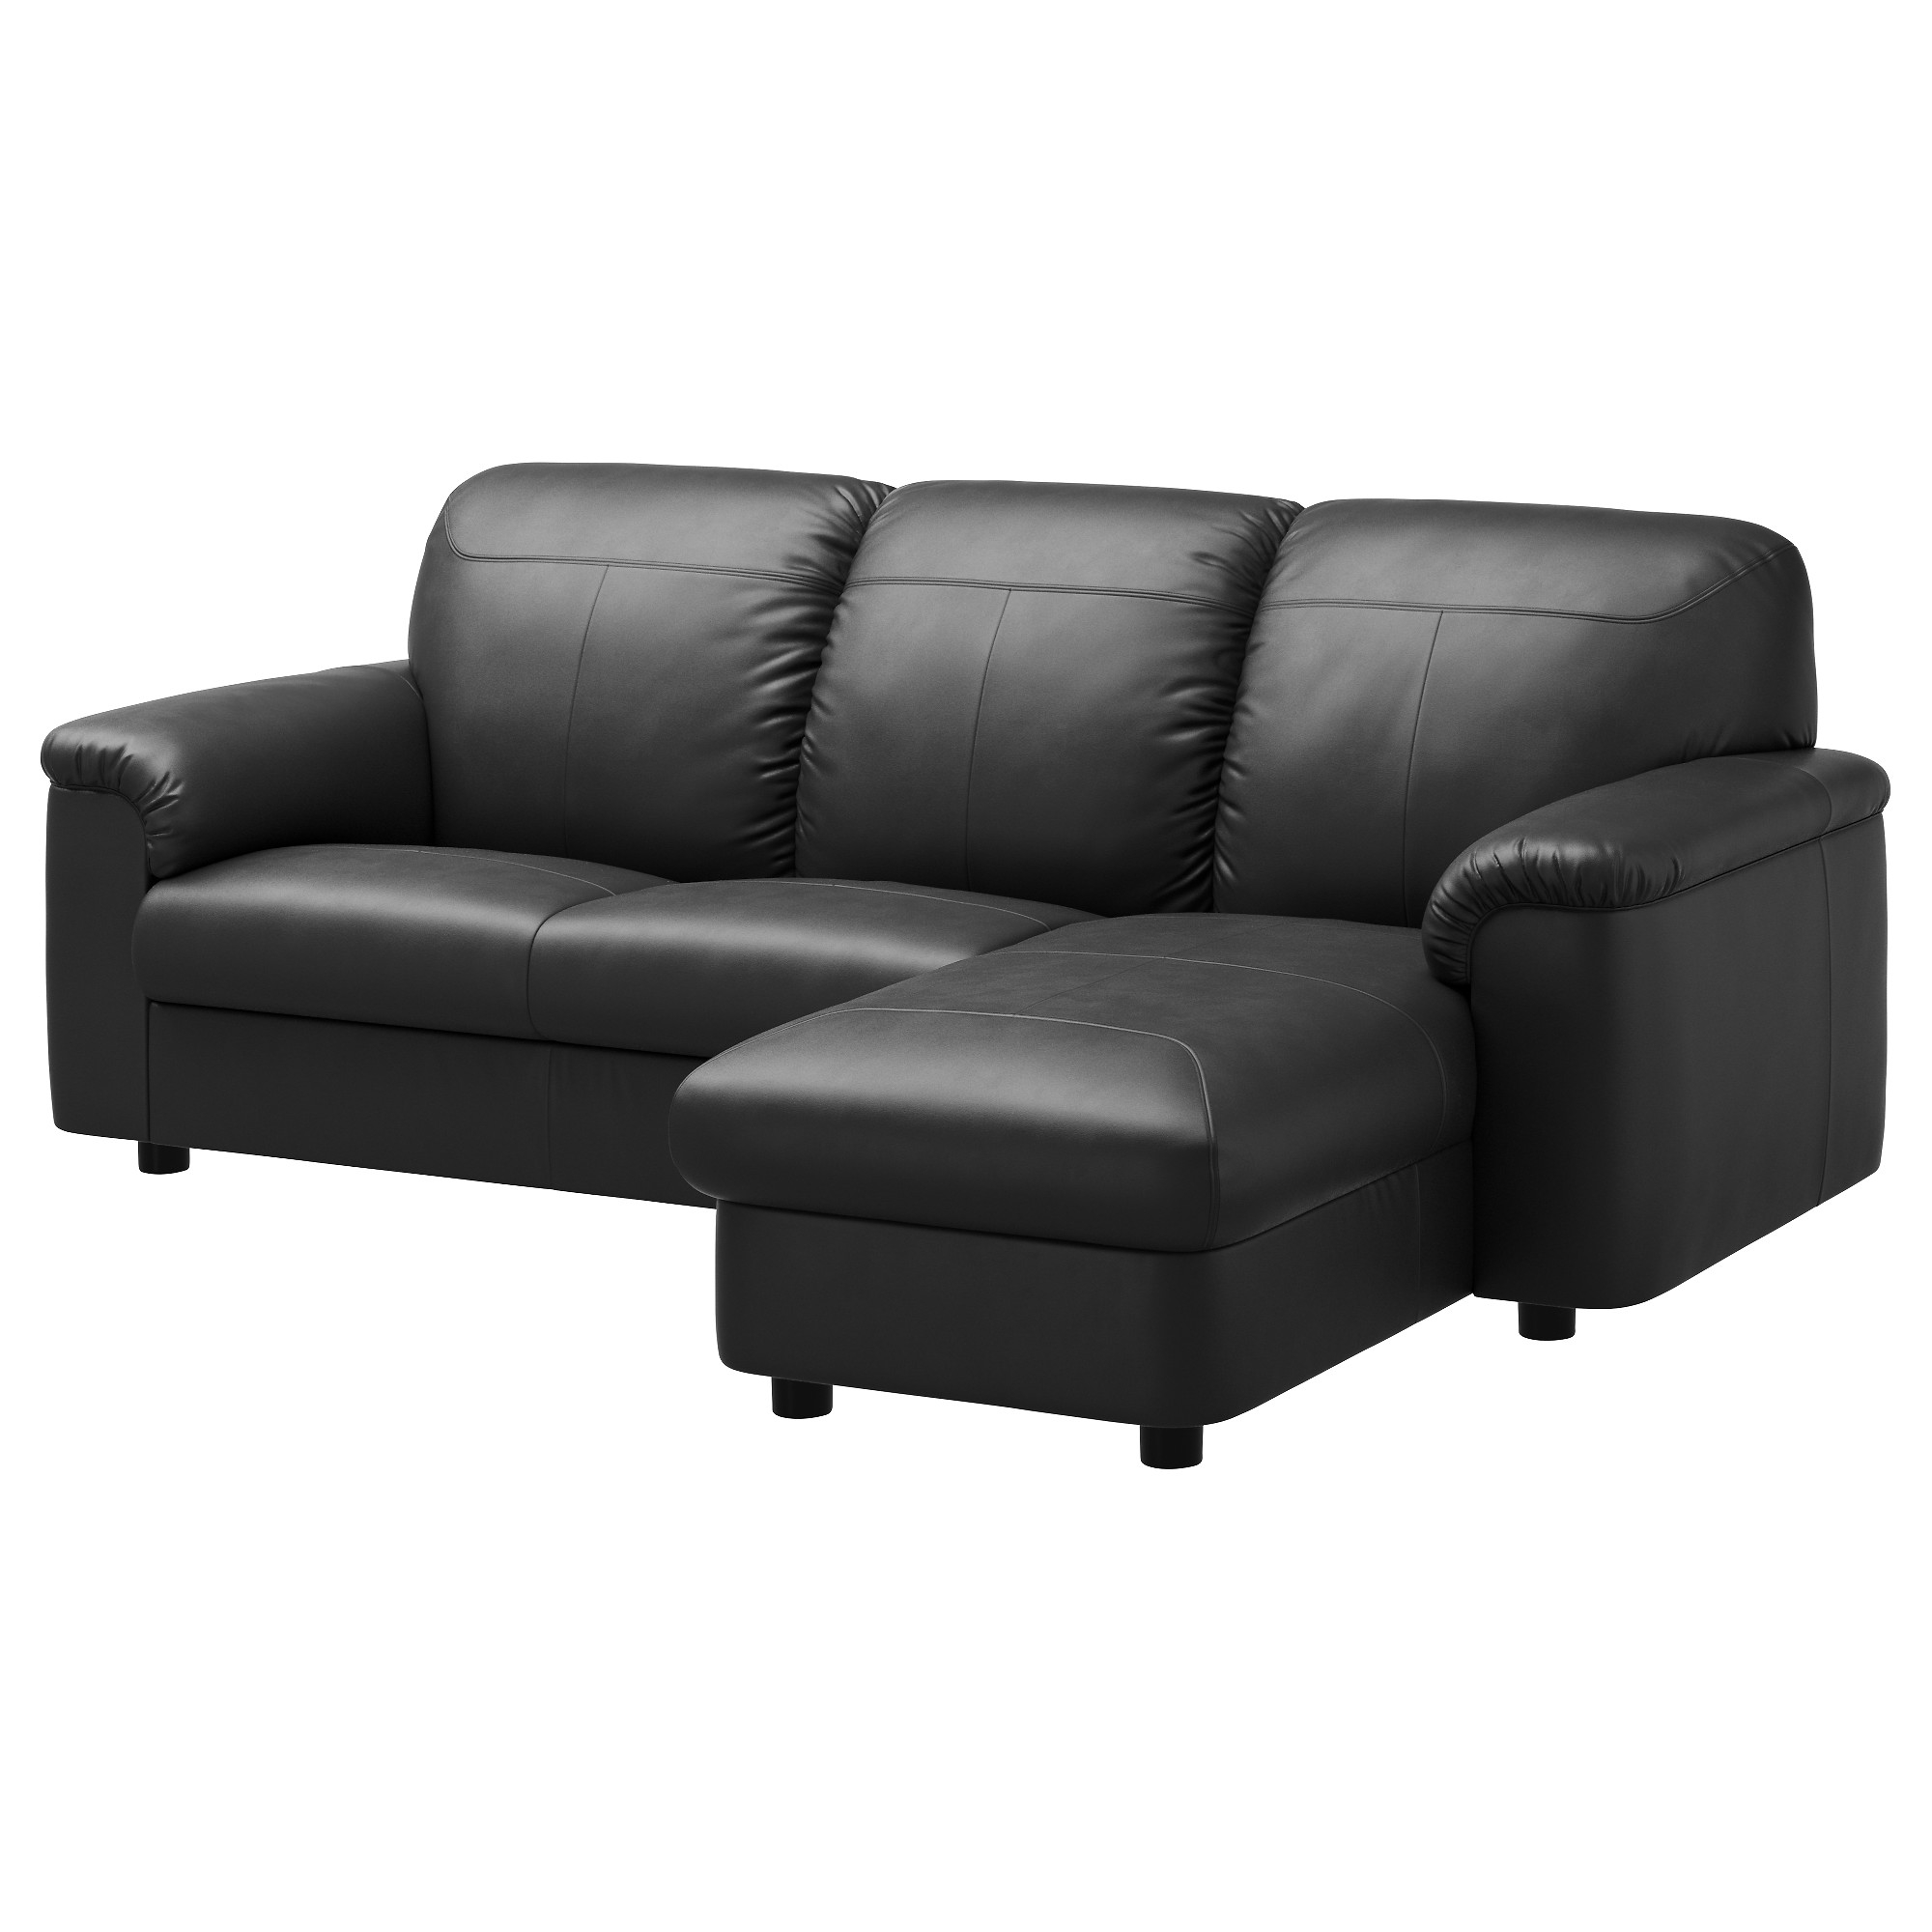 Timsfors sof 2 plazas chaise longue for Sofa 2 plazas chaise longue